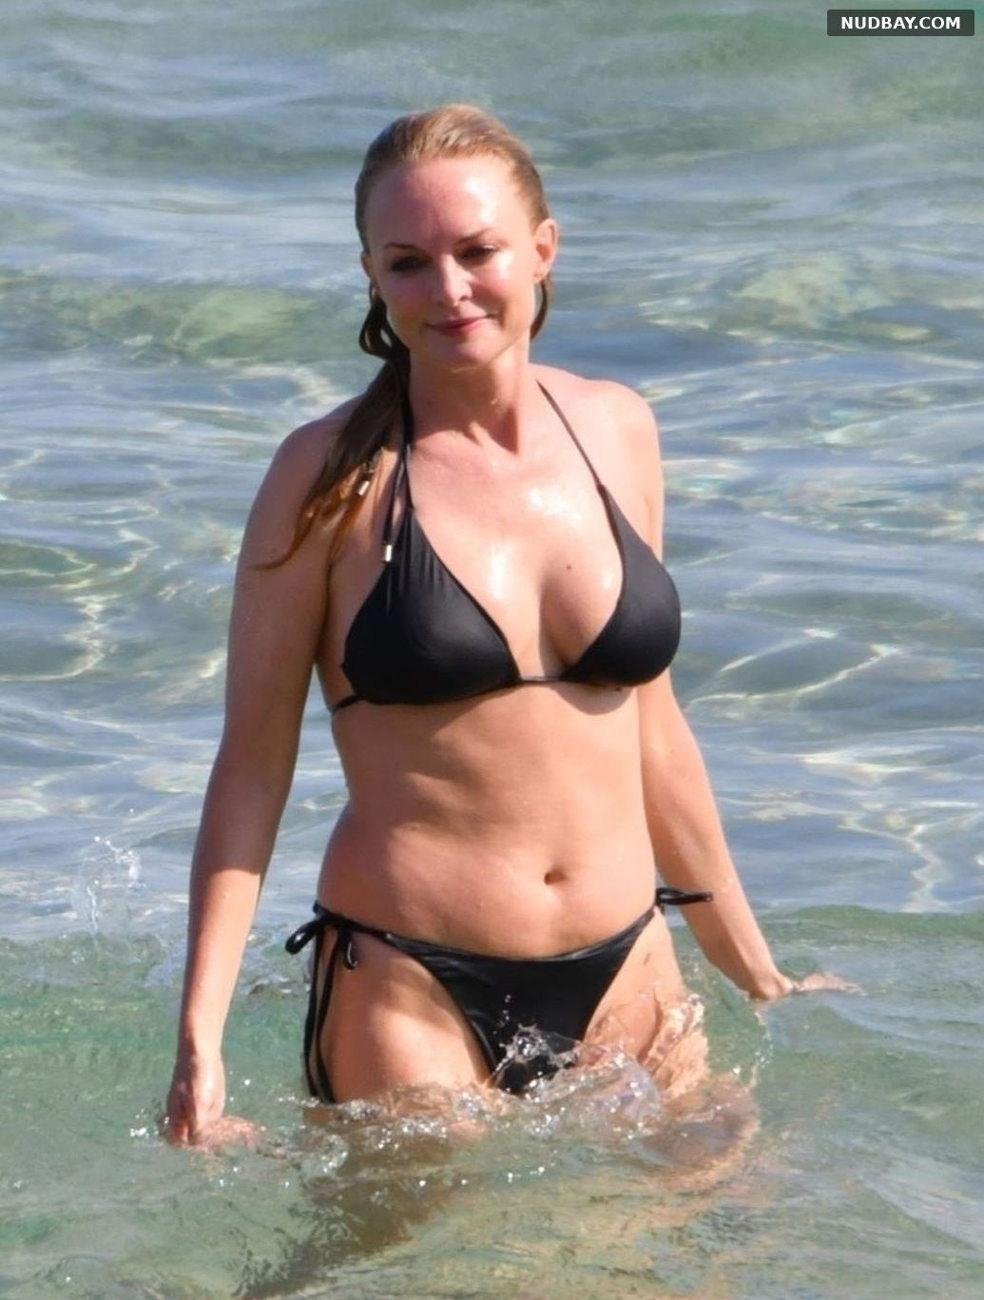 Heather Graham Wearing Bikinis in Sardinia Jul 22 2021